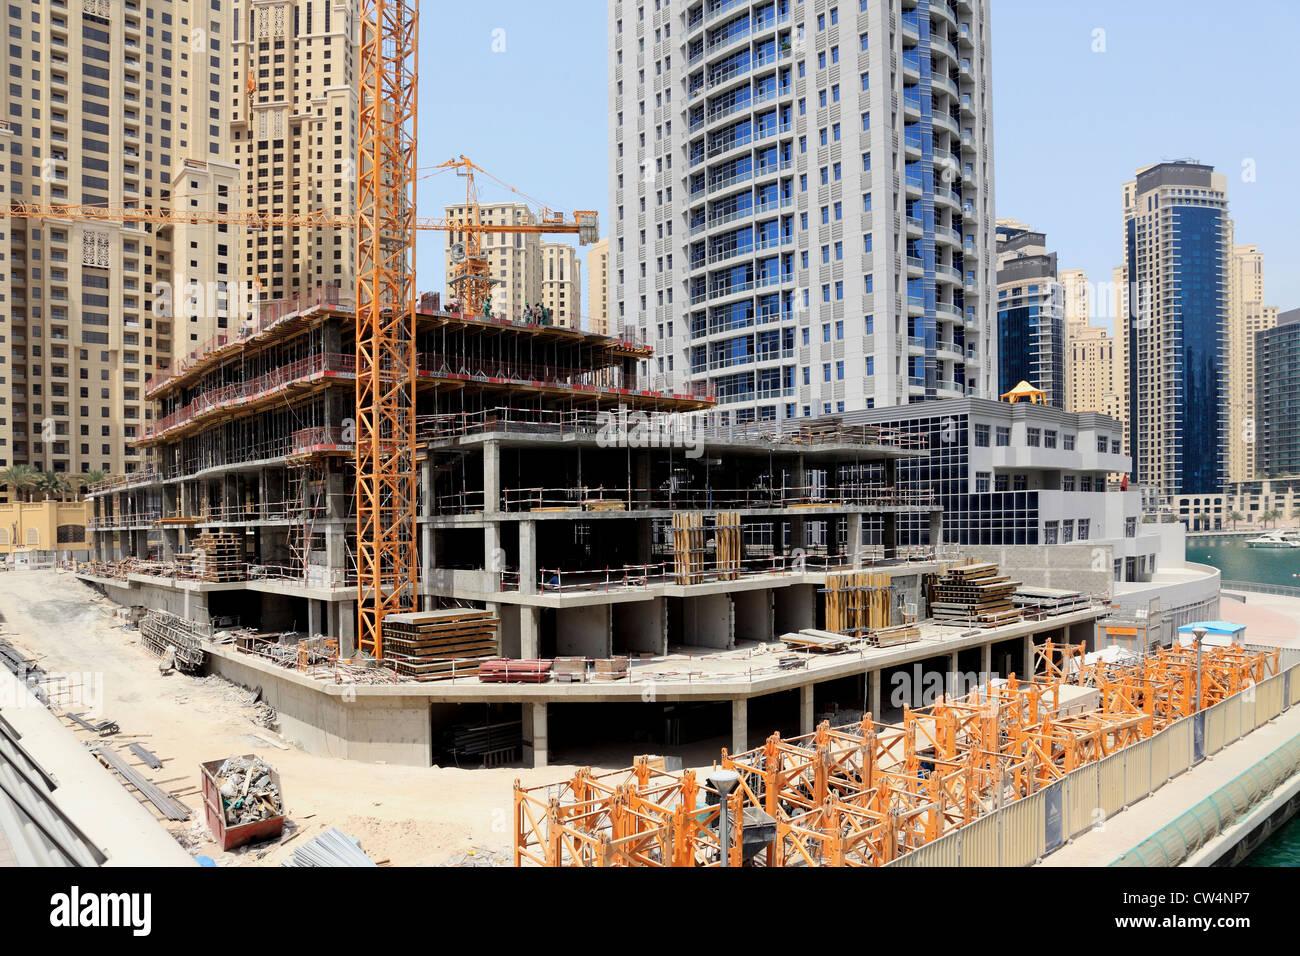 3607. Construction work, Dubai Marina, Dubai, UAE. Stock Photo